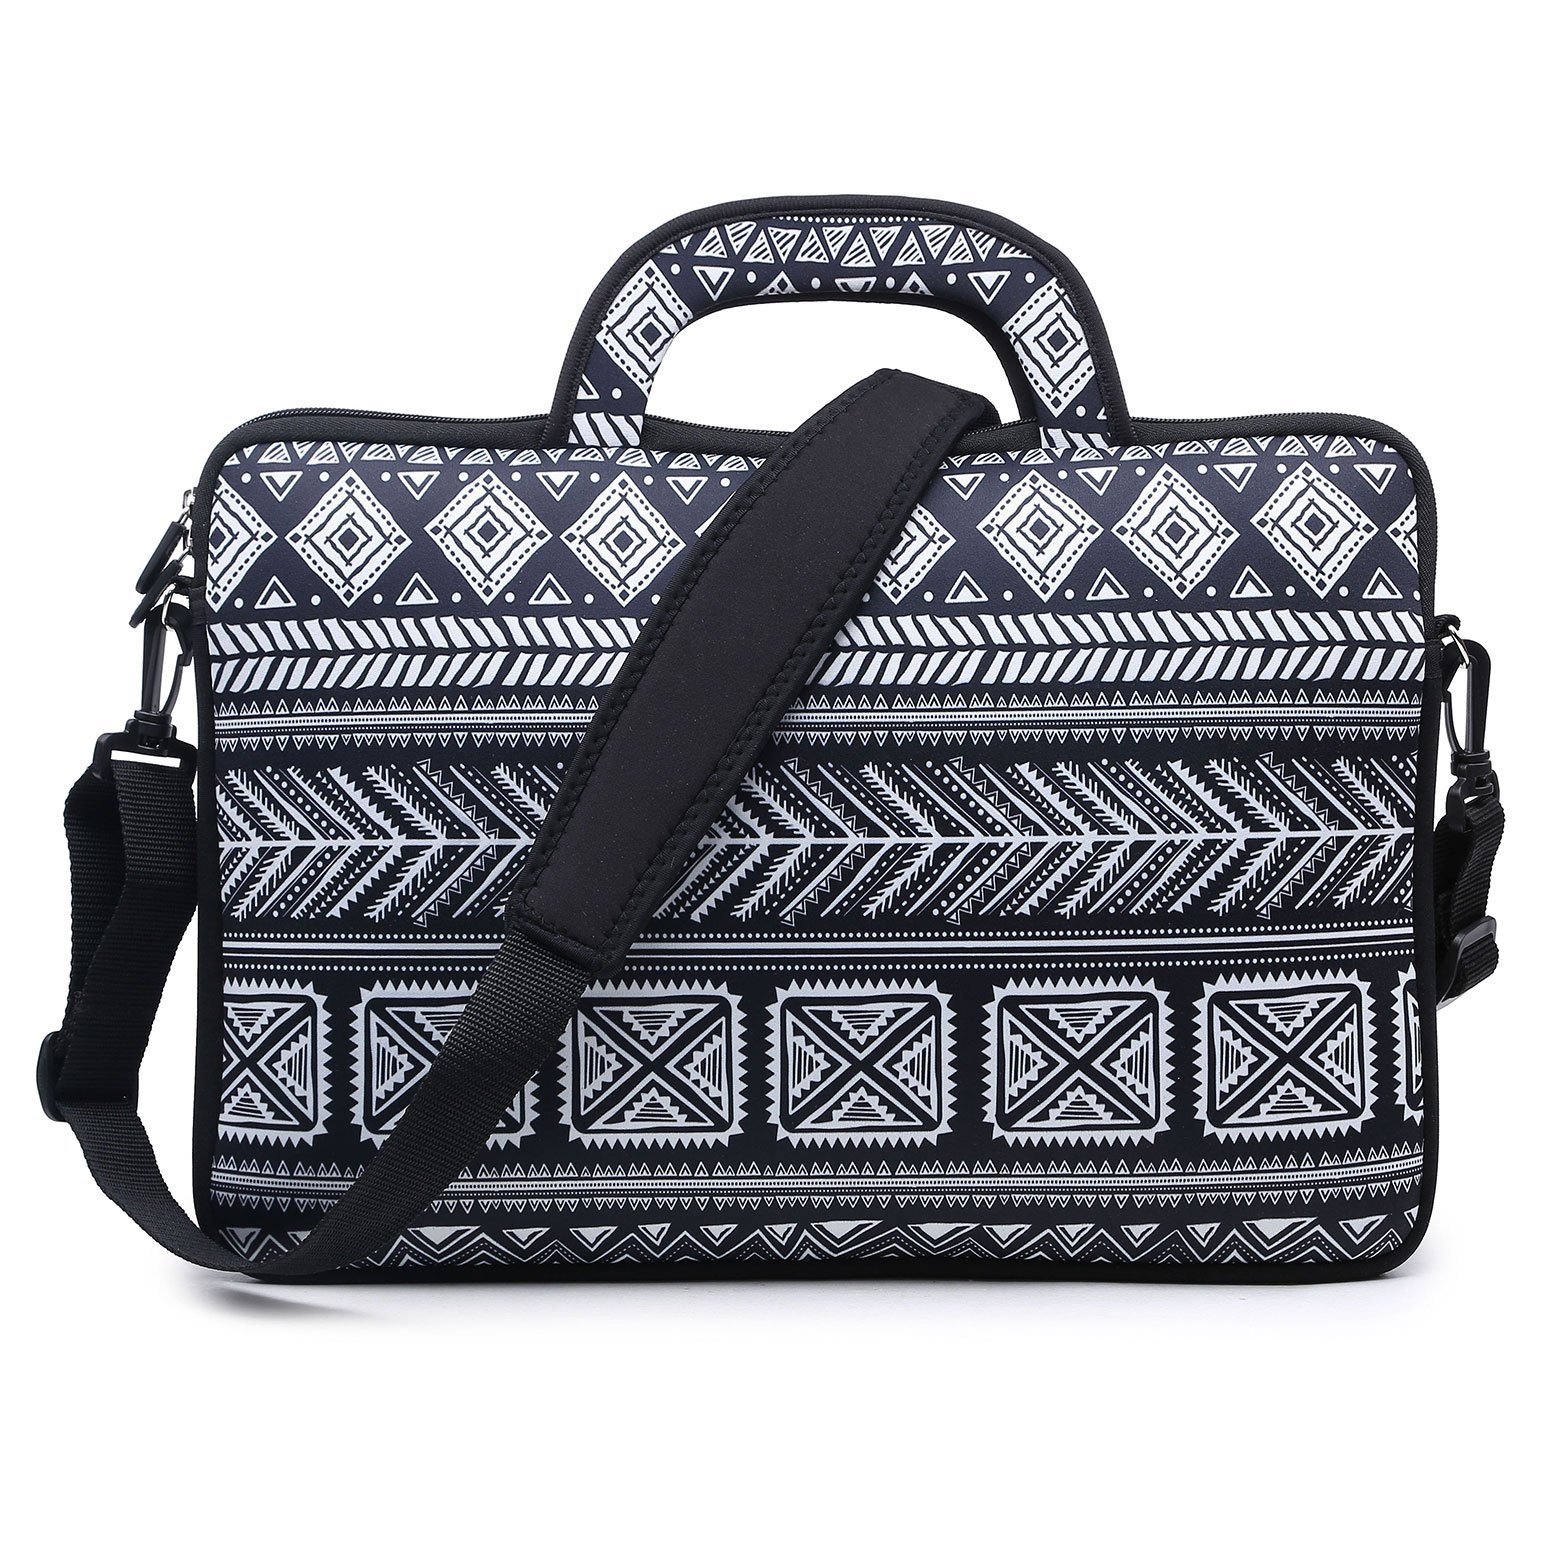 Meffort Inc 15 15.6 inch Water Resistance Neoprene Laptop Briefcase Bag Carrying Case - Black Gary Pattern A